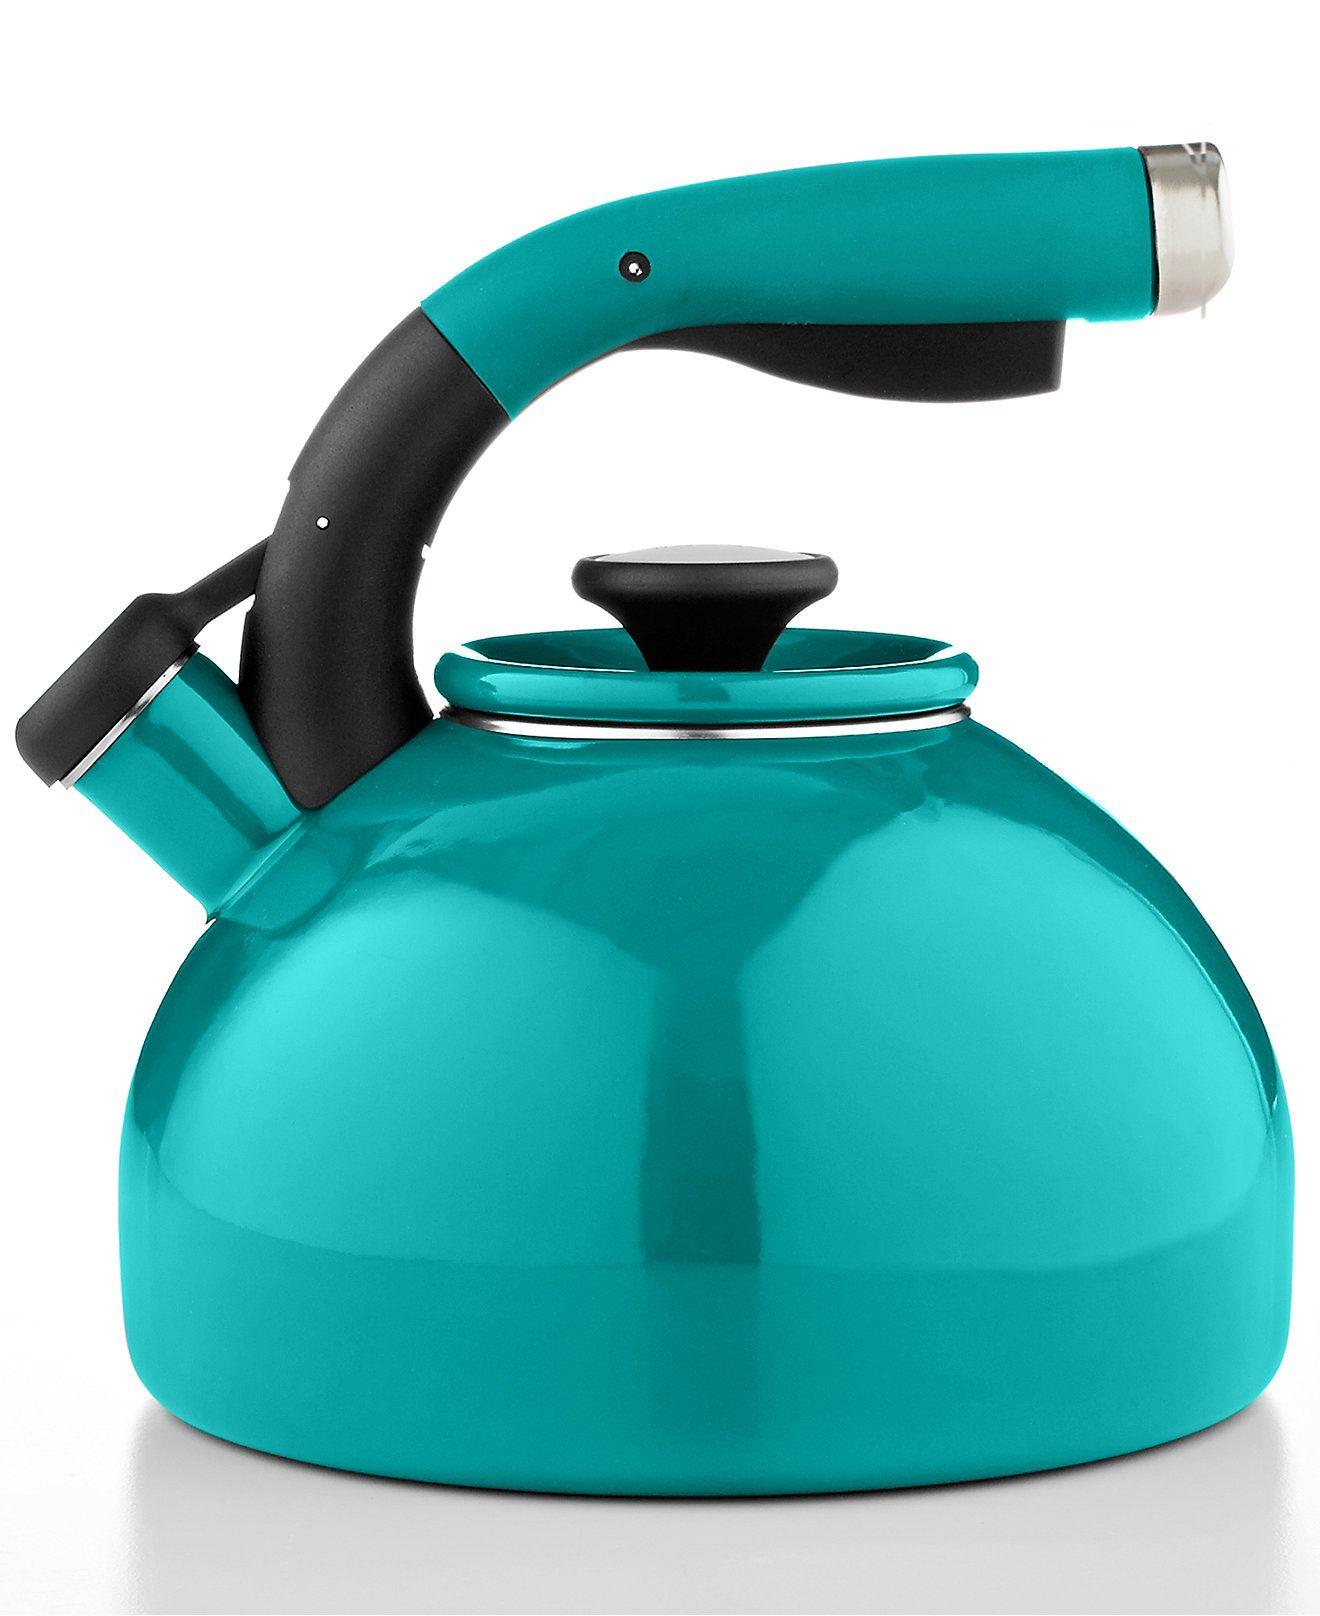 Circulon morning bird 2 qt tea kettle reviews